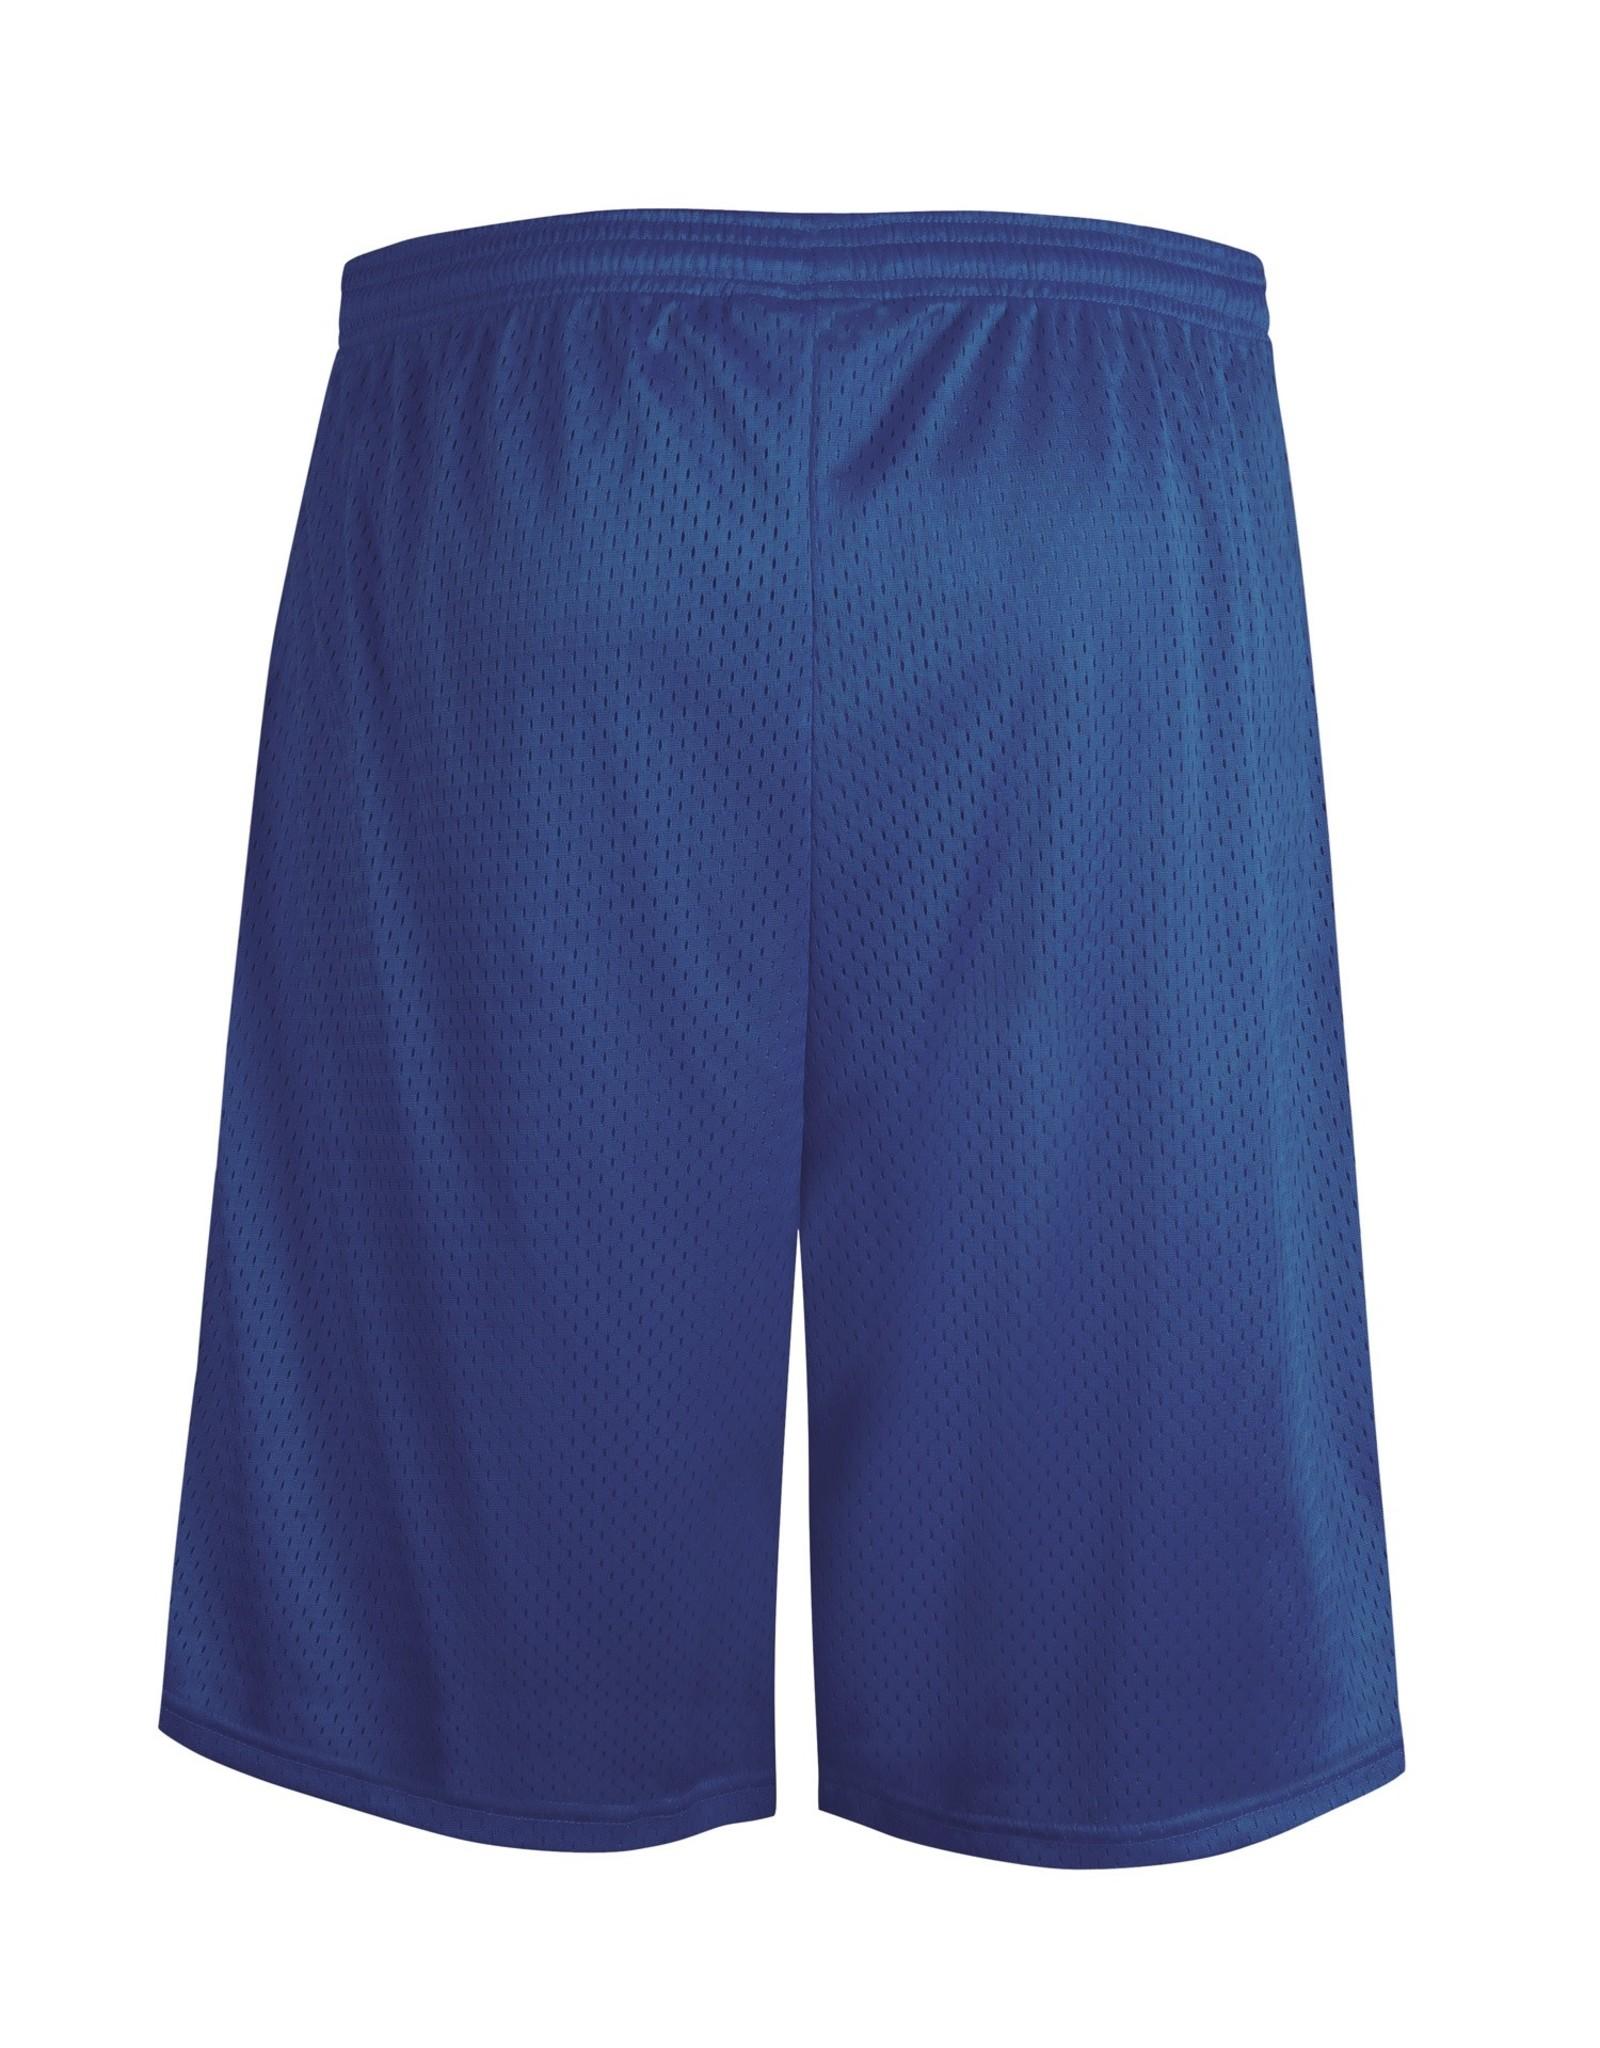 Champion Mesh Shorts - 8731 /